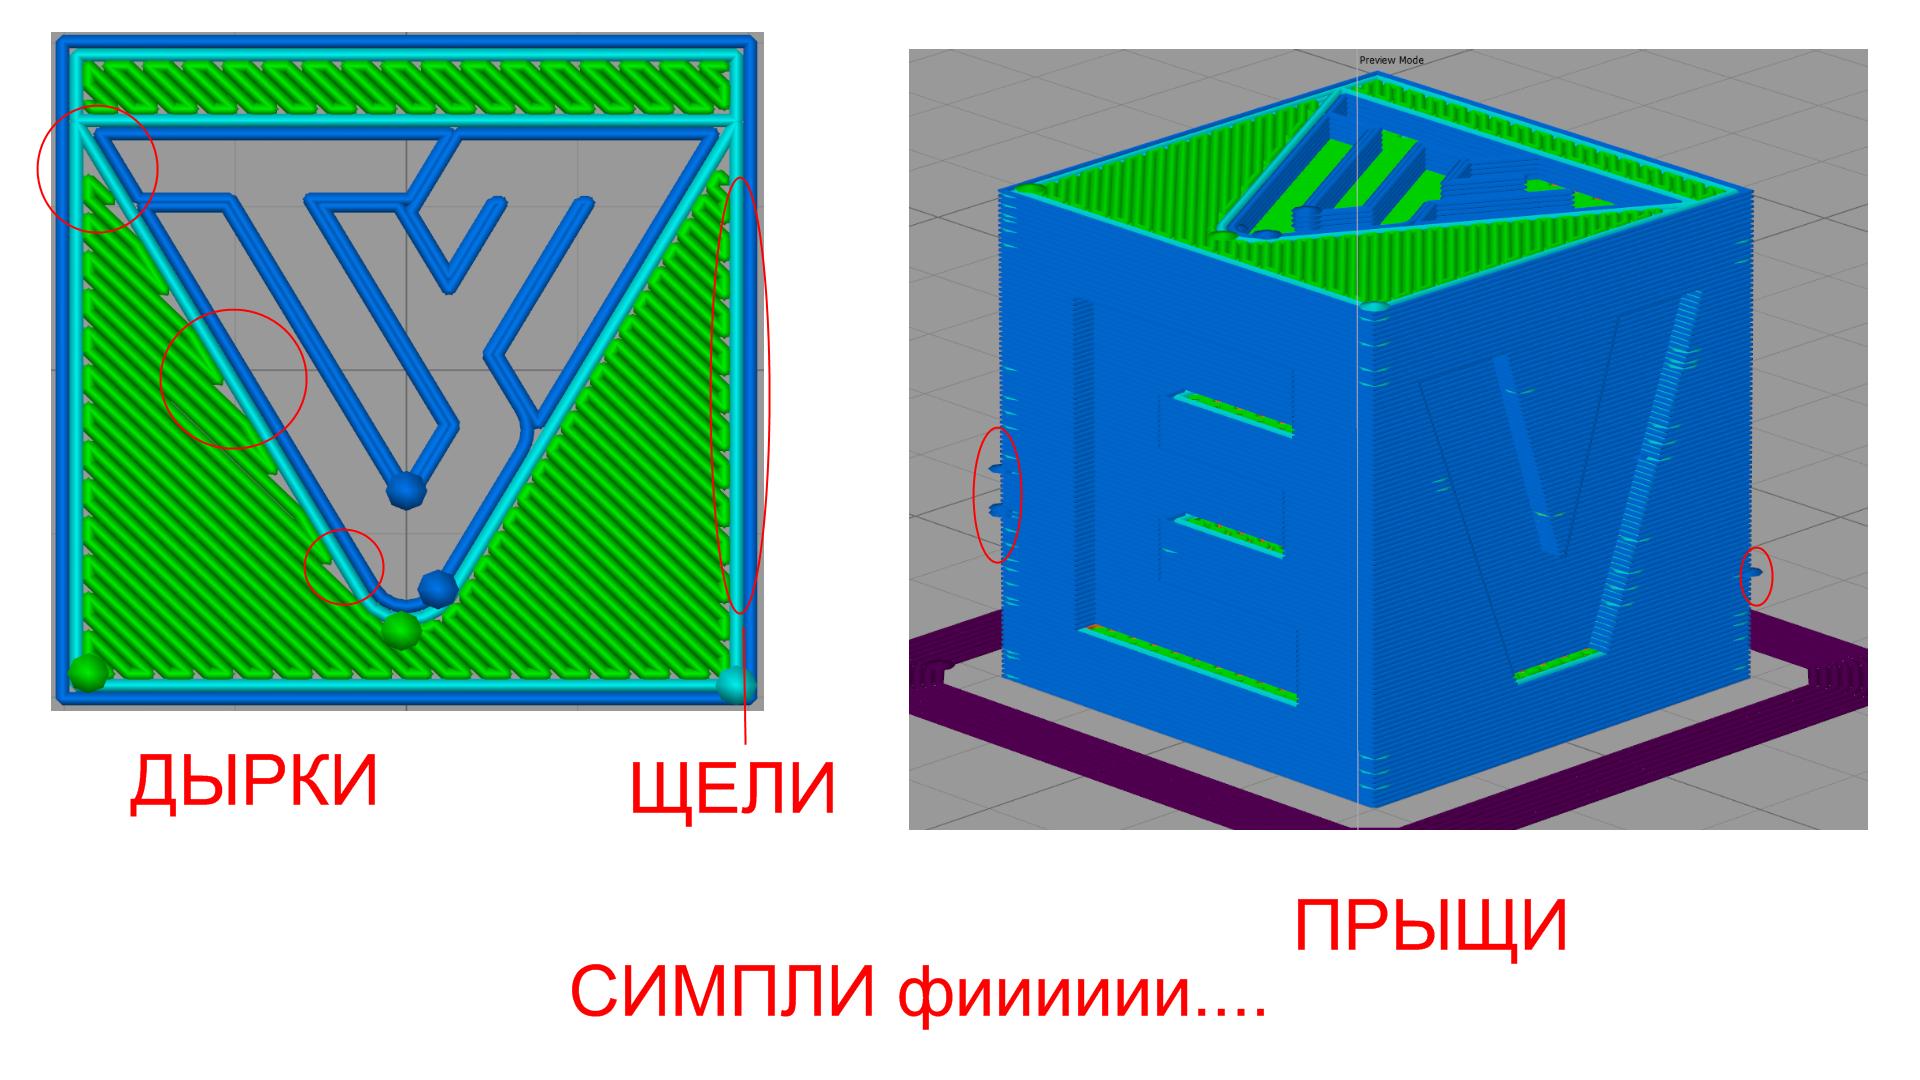 Cura VS Simplify3D prt 3 - раболаторная лабота !